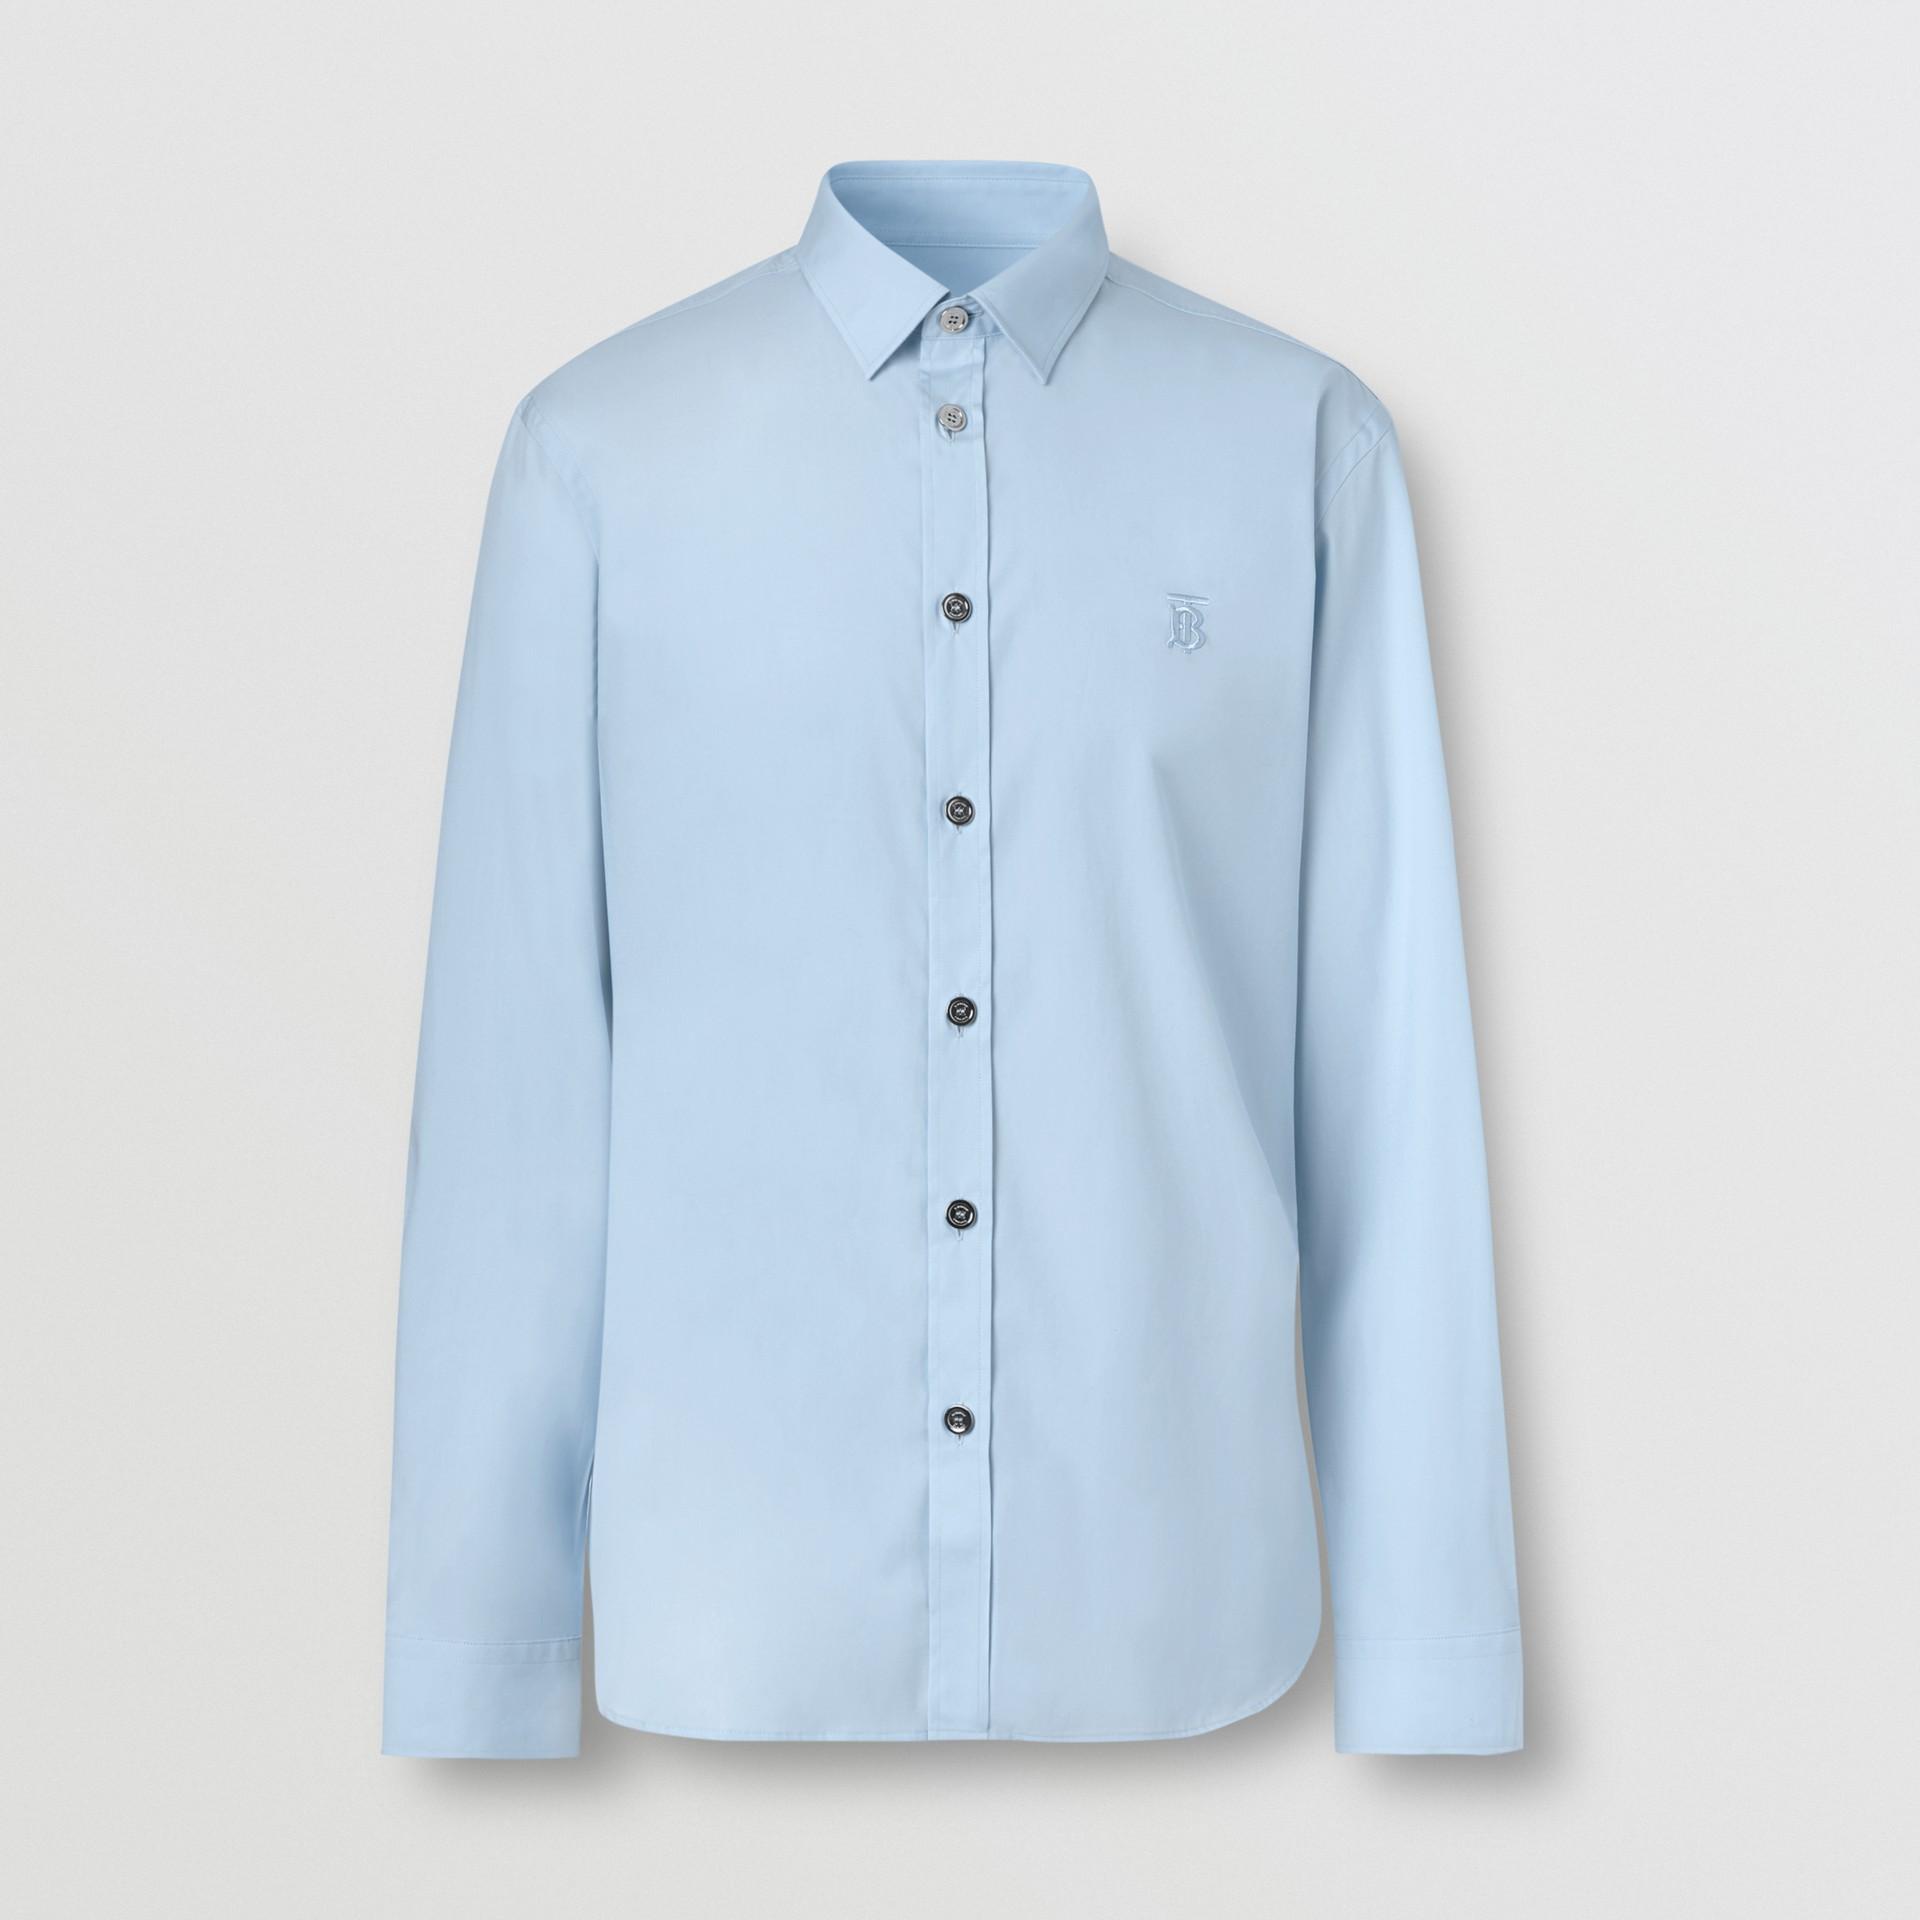 Monogram Motif Stretch Cotton Poplin Shirt in Pale Blue - Men   Burberry Australia - gallery image 3